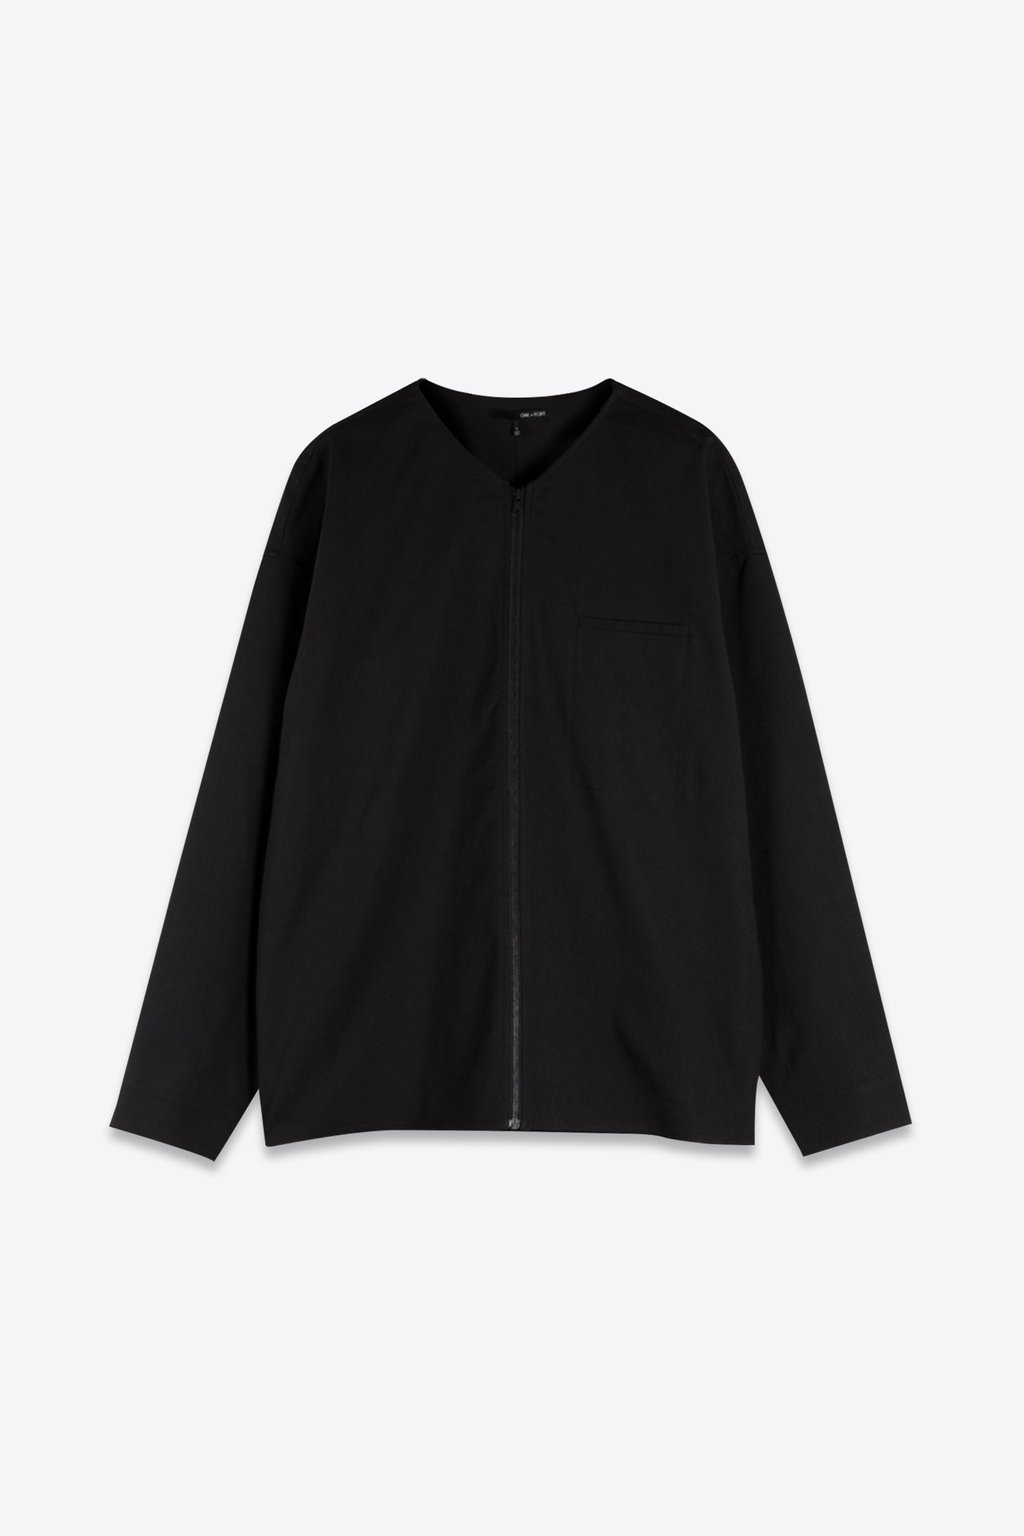 Shirt 1158 Black 6